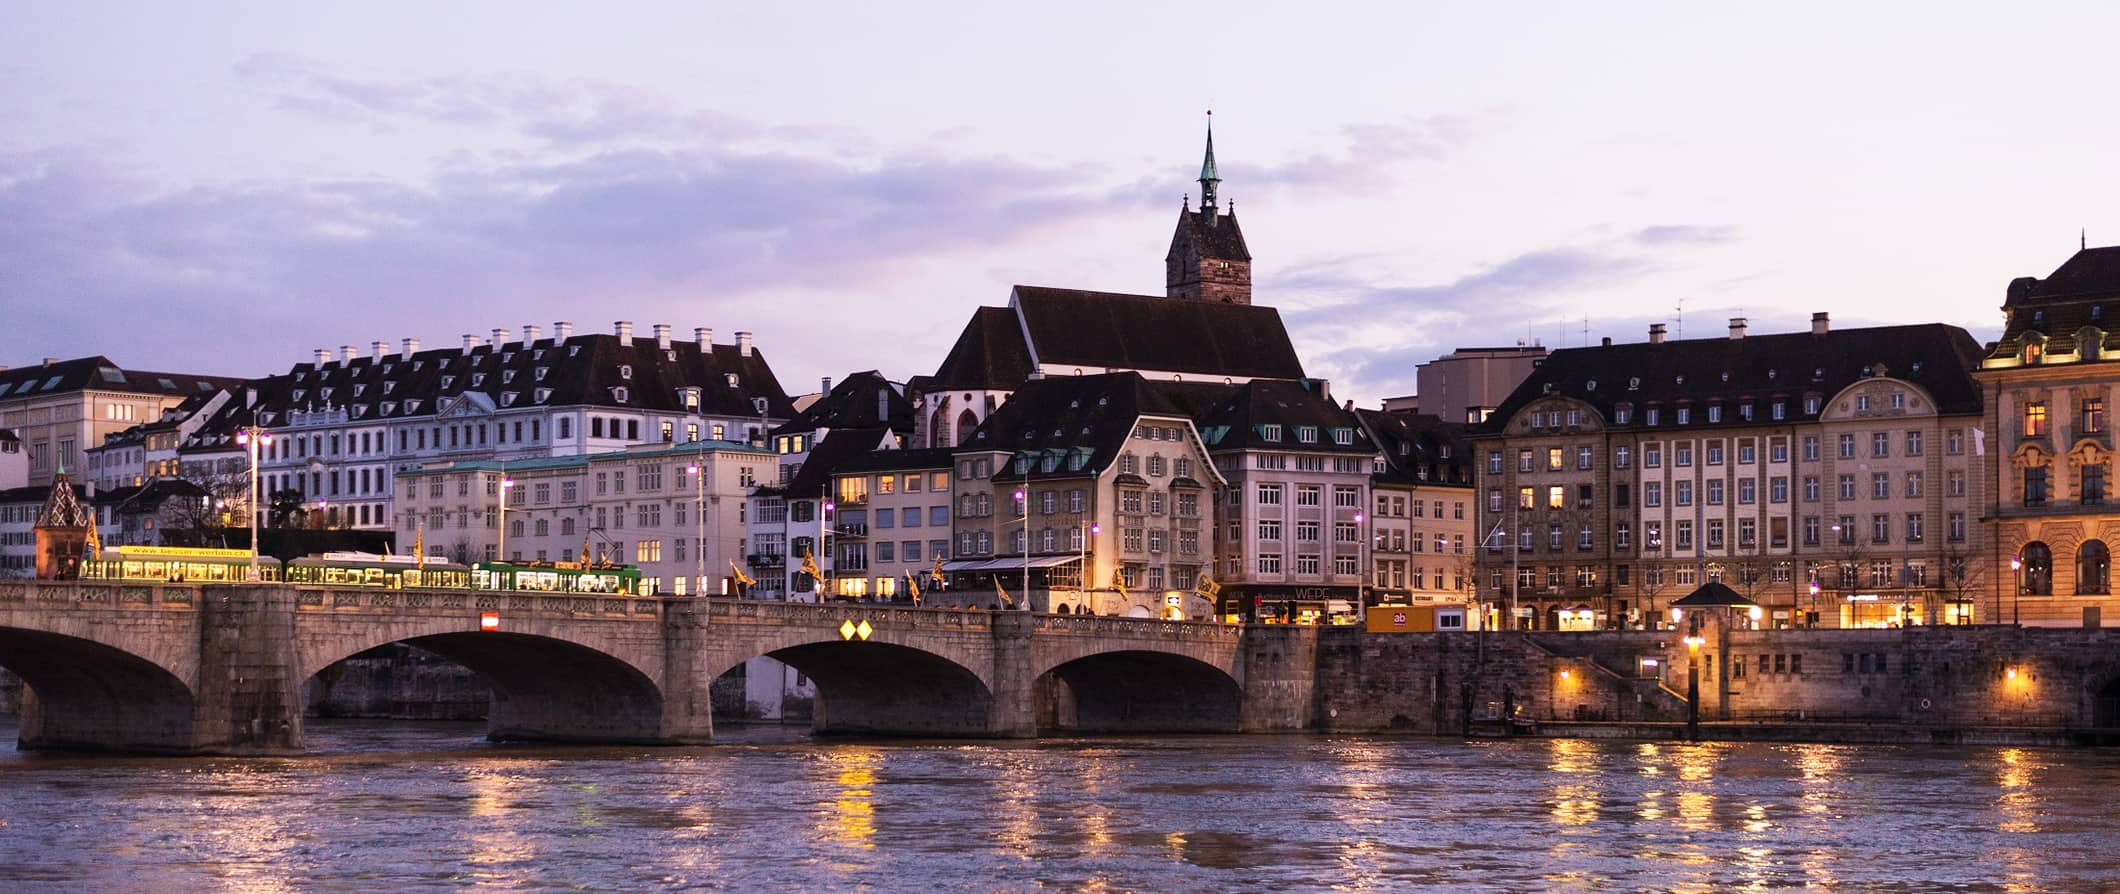 the bridge over the Rhine River, Basel